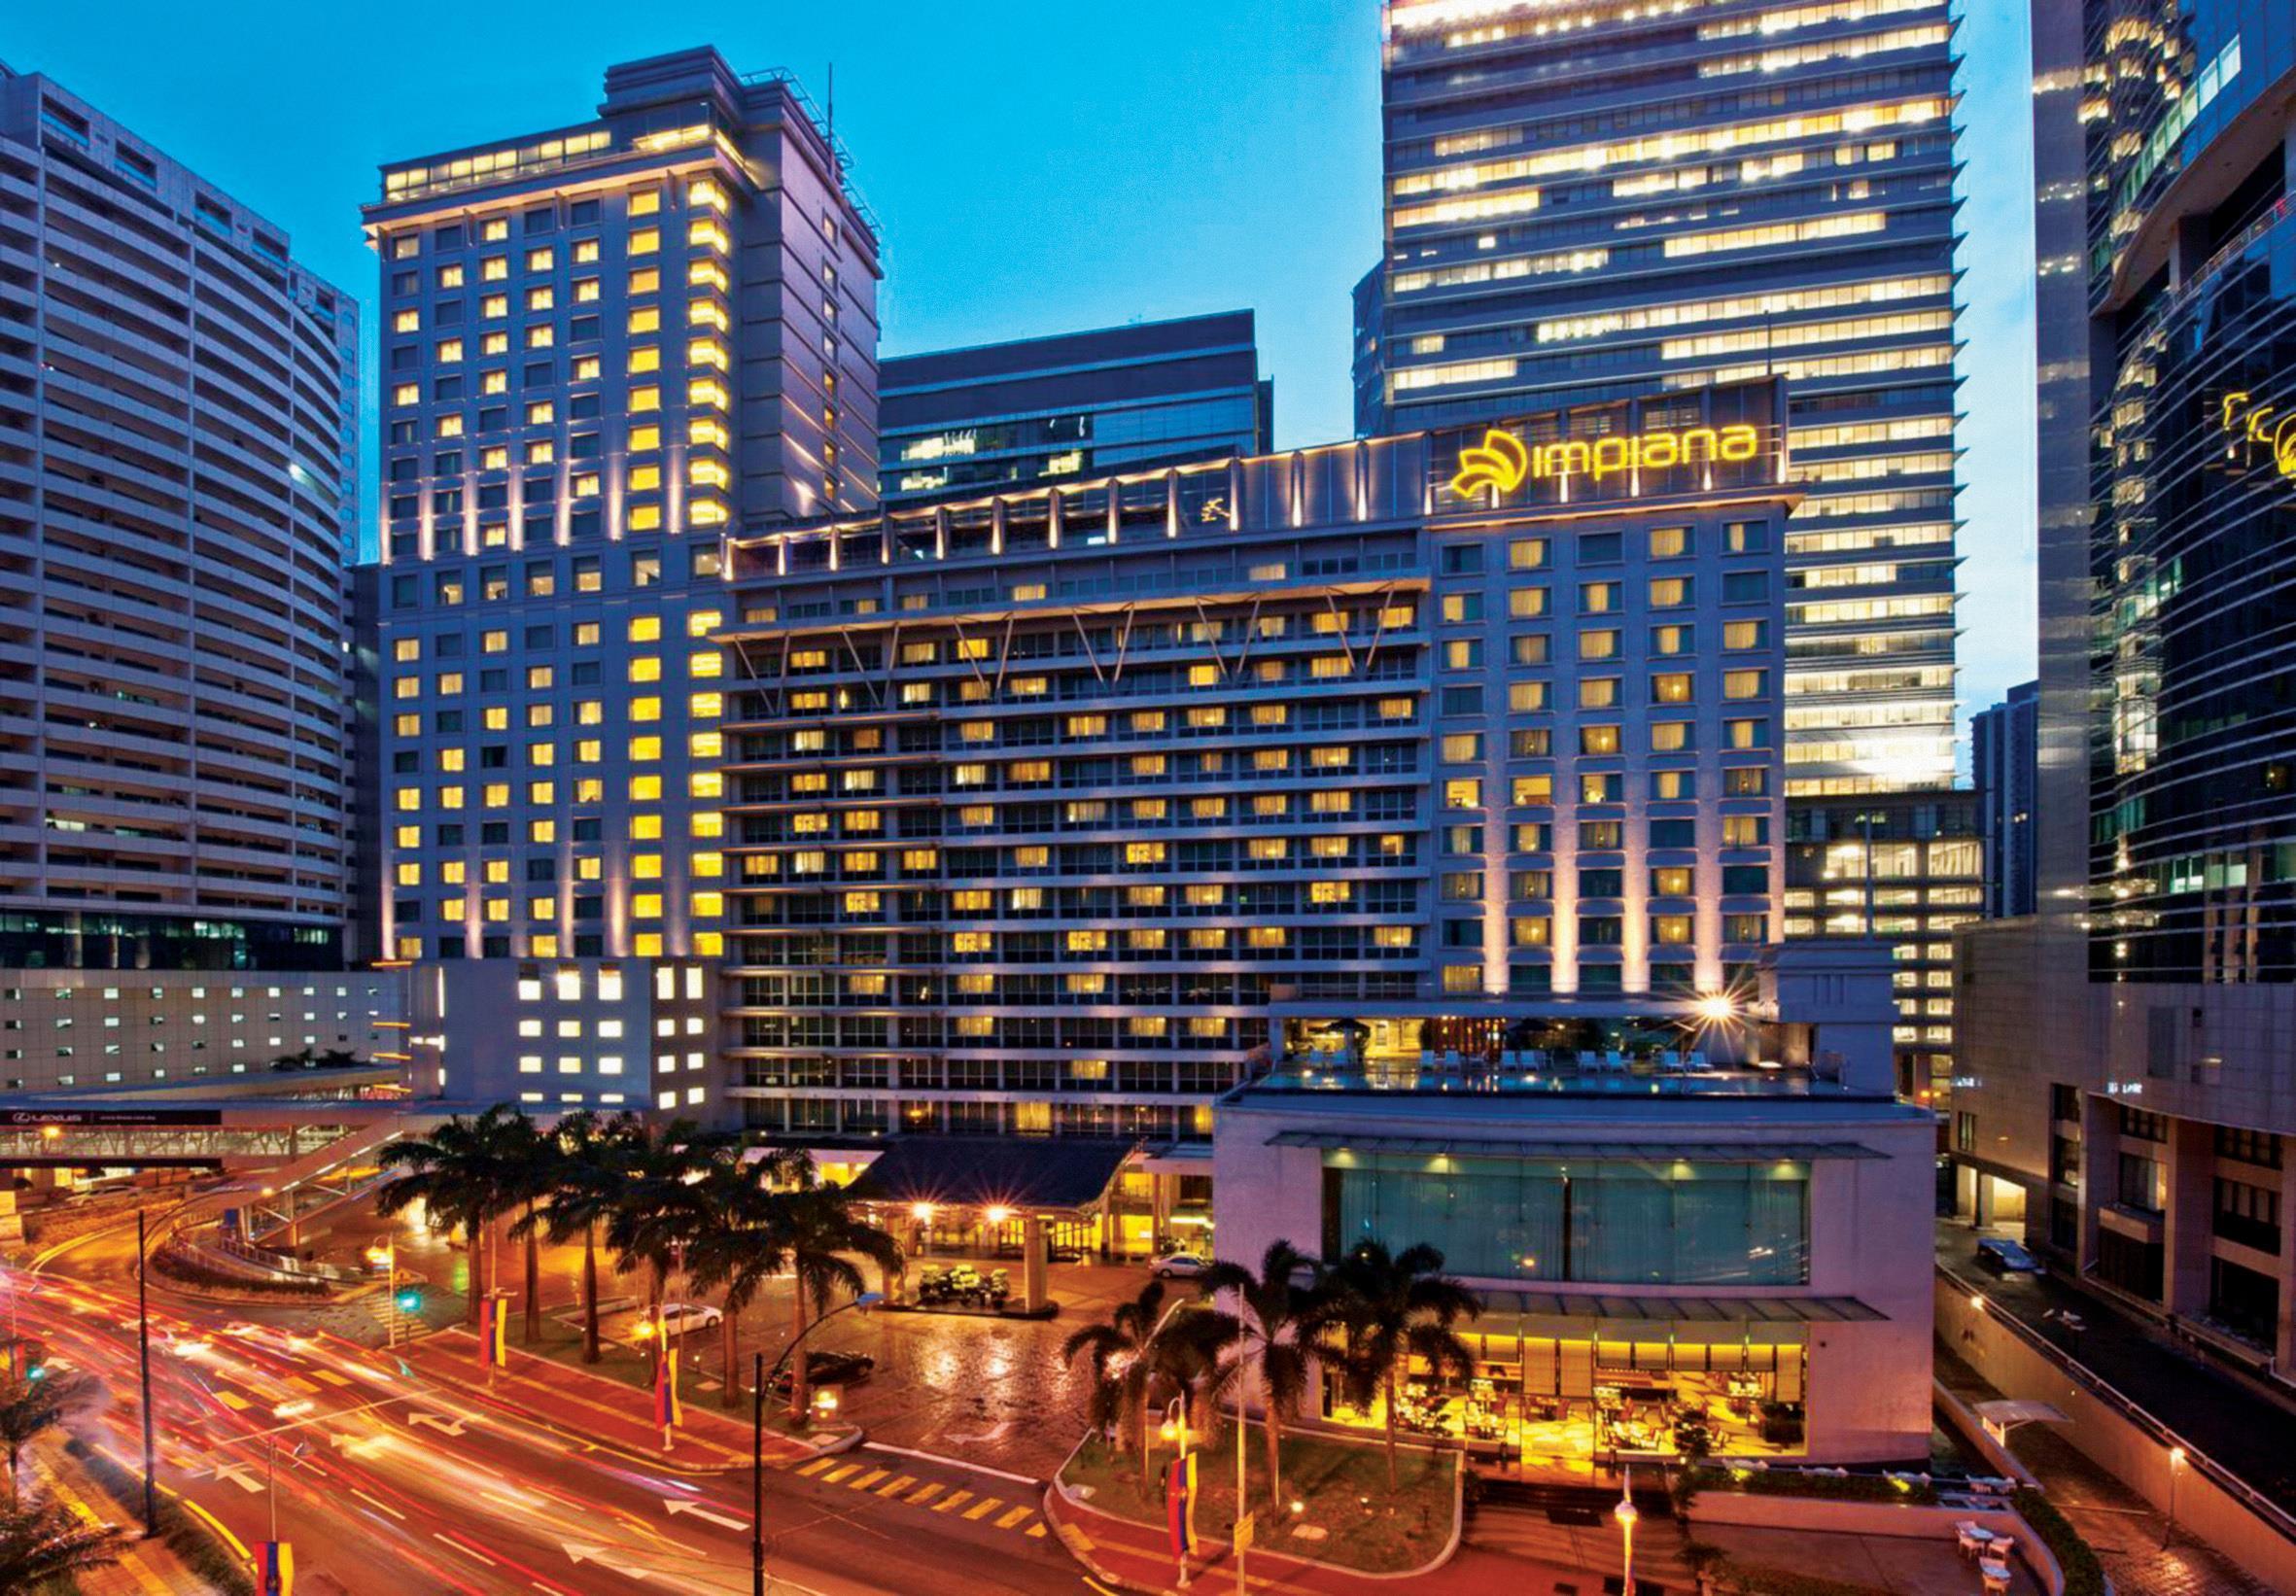 12 Best Hotels In Kuala Lumpur Hotels From 6 Night Kayak